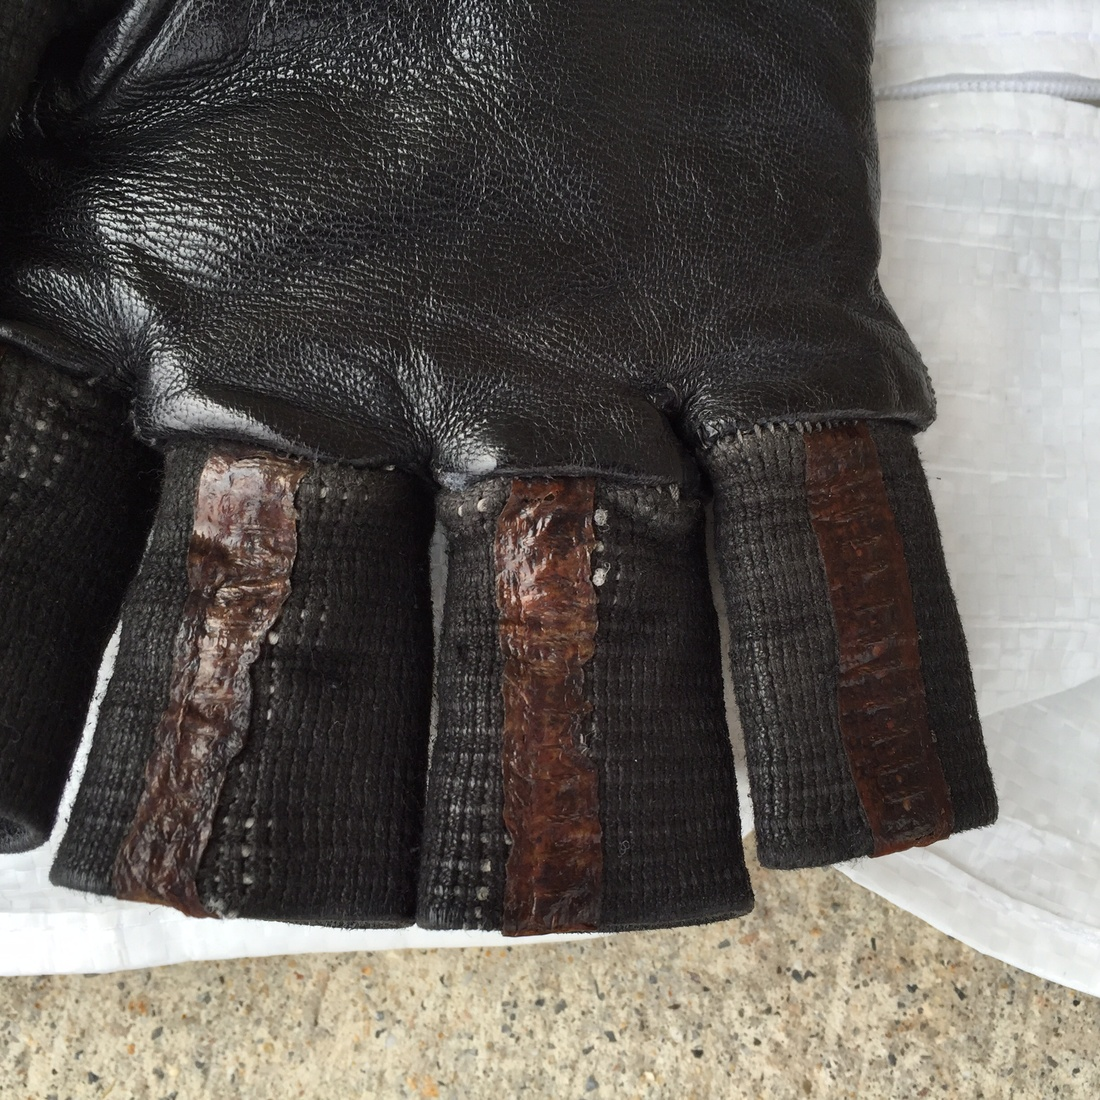 Black leather cut off gloves -  Carol Christian Poell Black Leather Cut Off Gloves Size 40 2